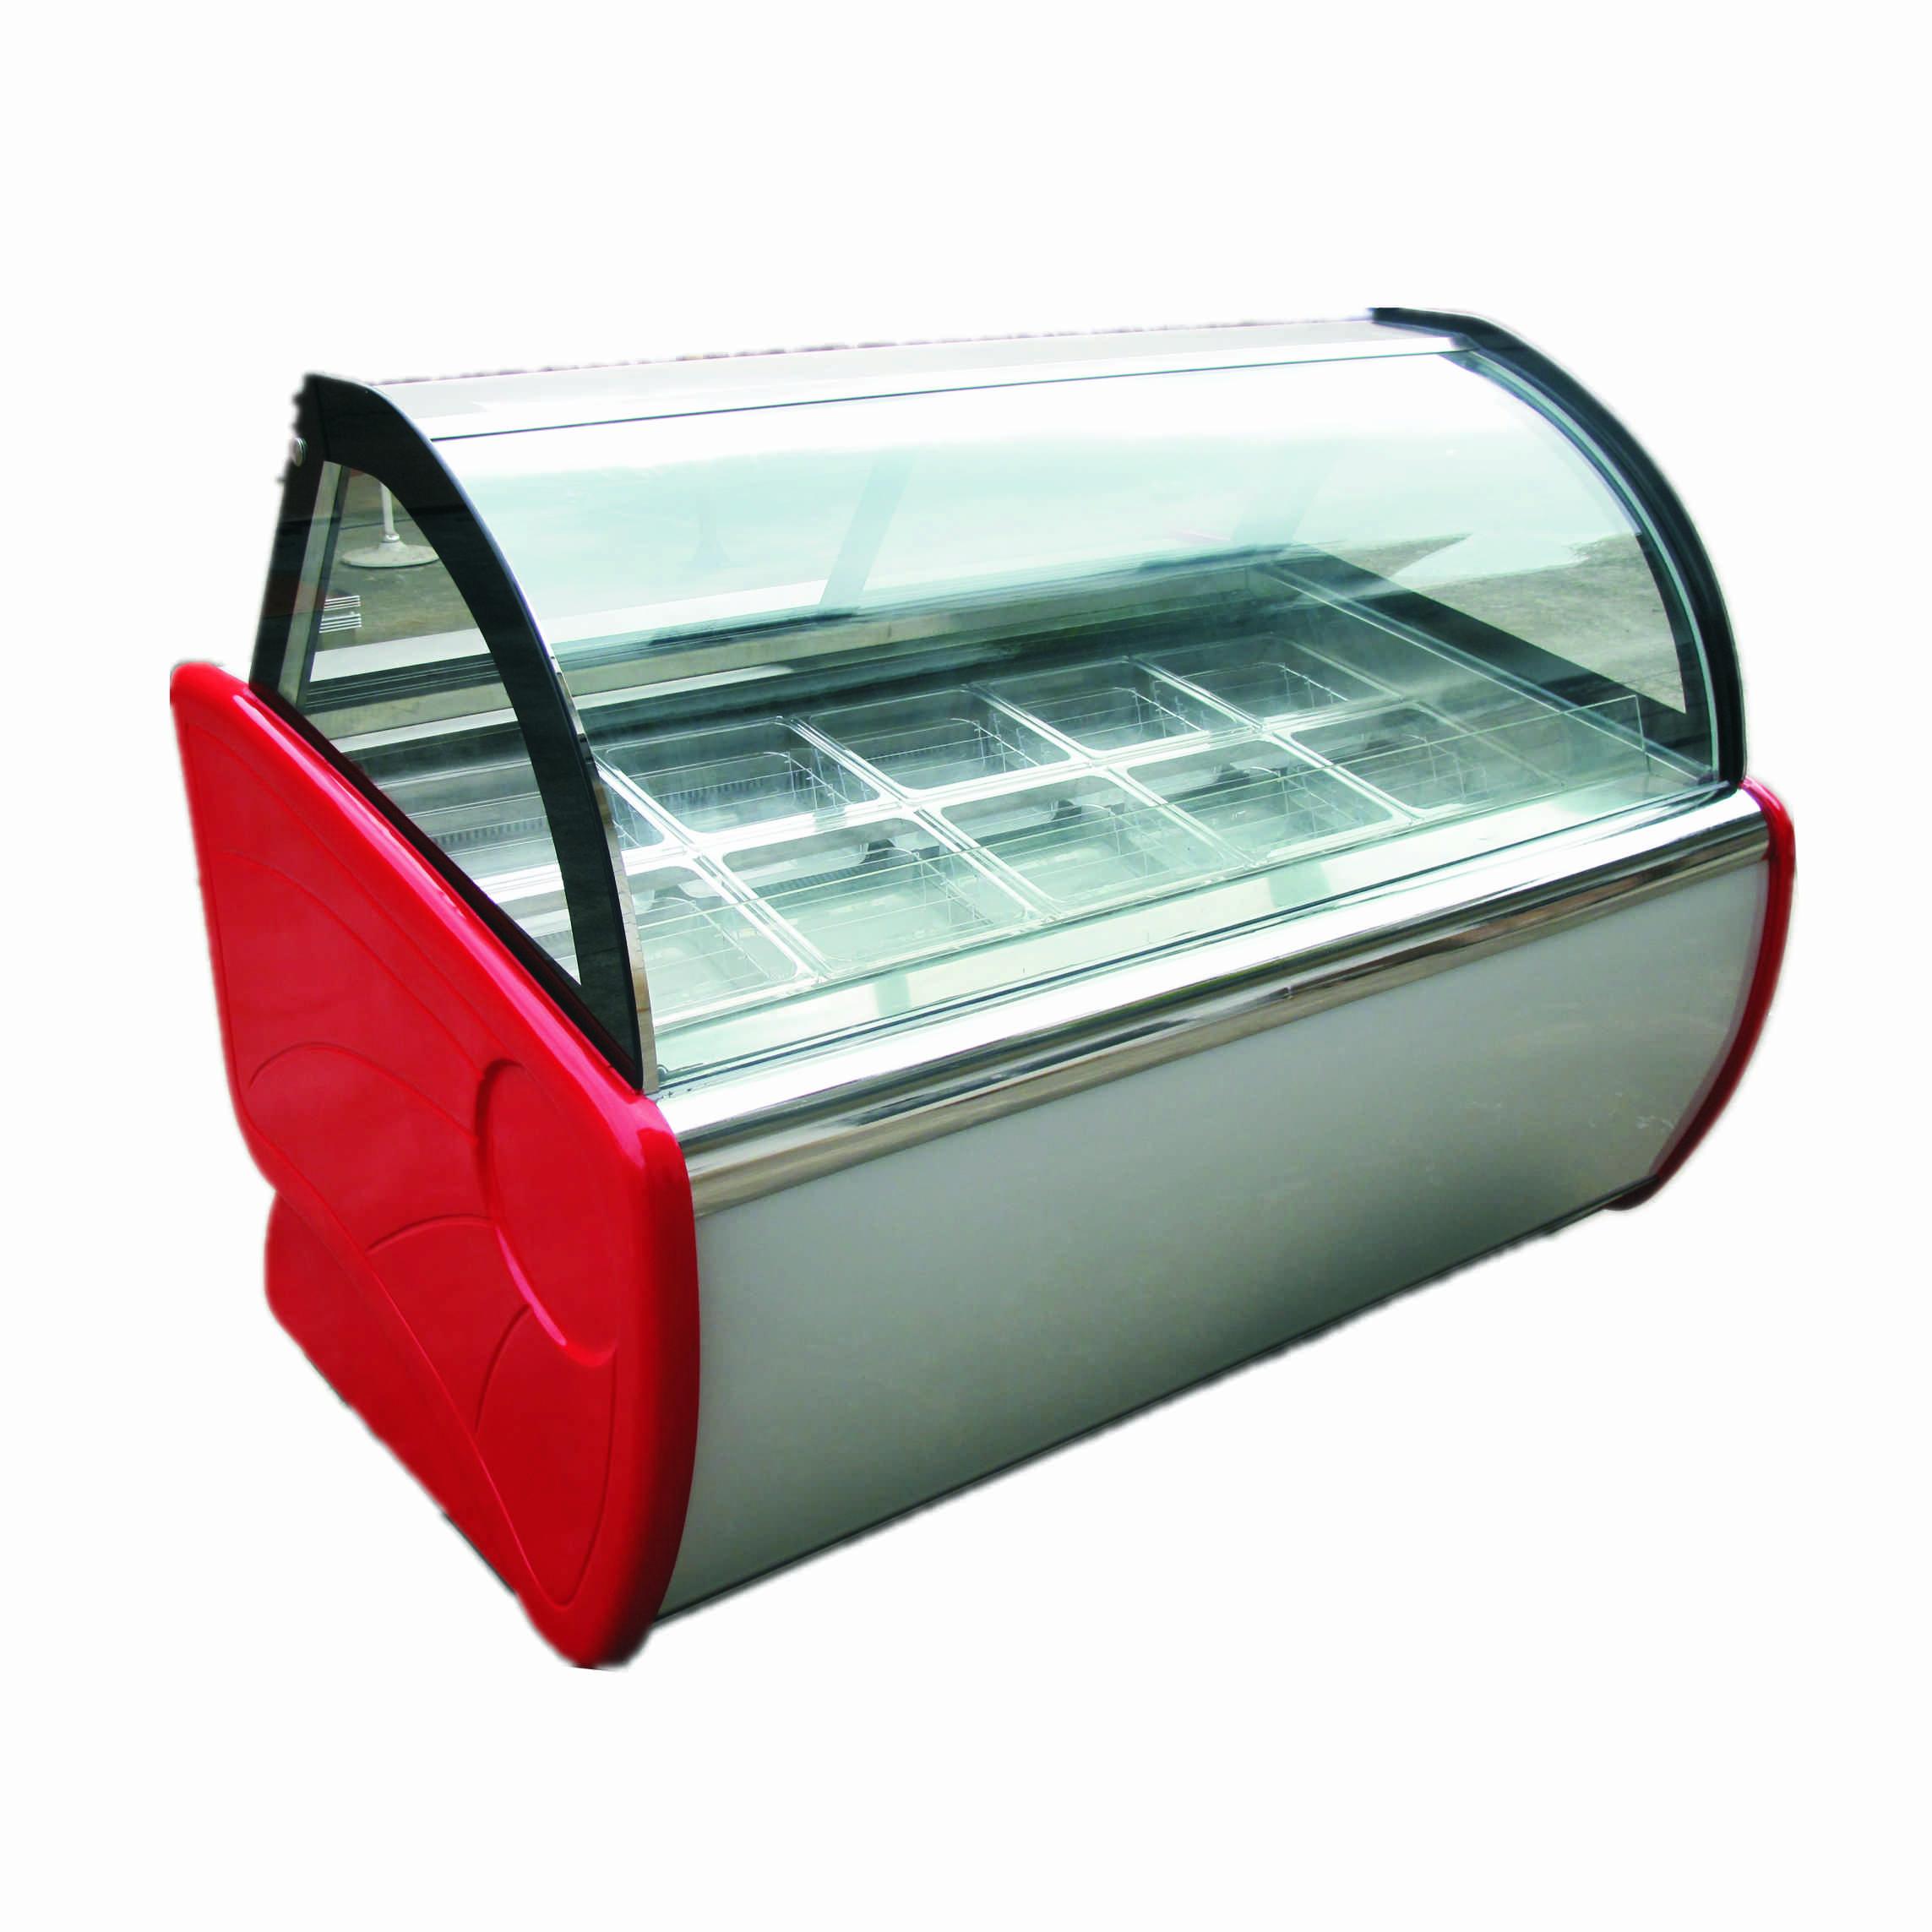 20 plates 304 material Curved Sliding Glass Door Italy Gelato Hard Ice Cream Showcase Refrigerator Display Cooler